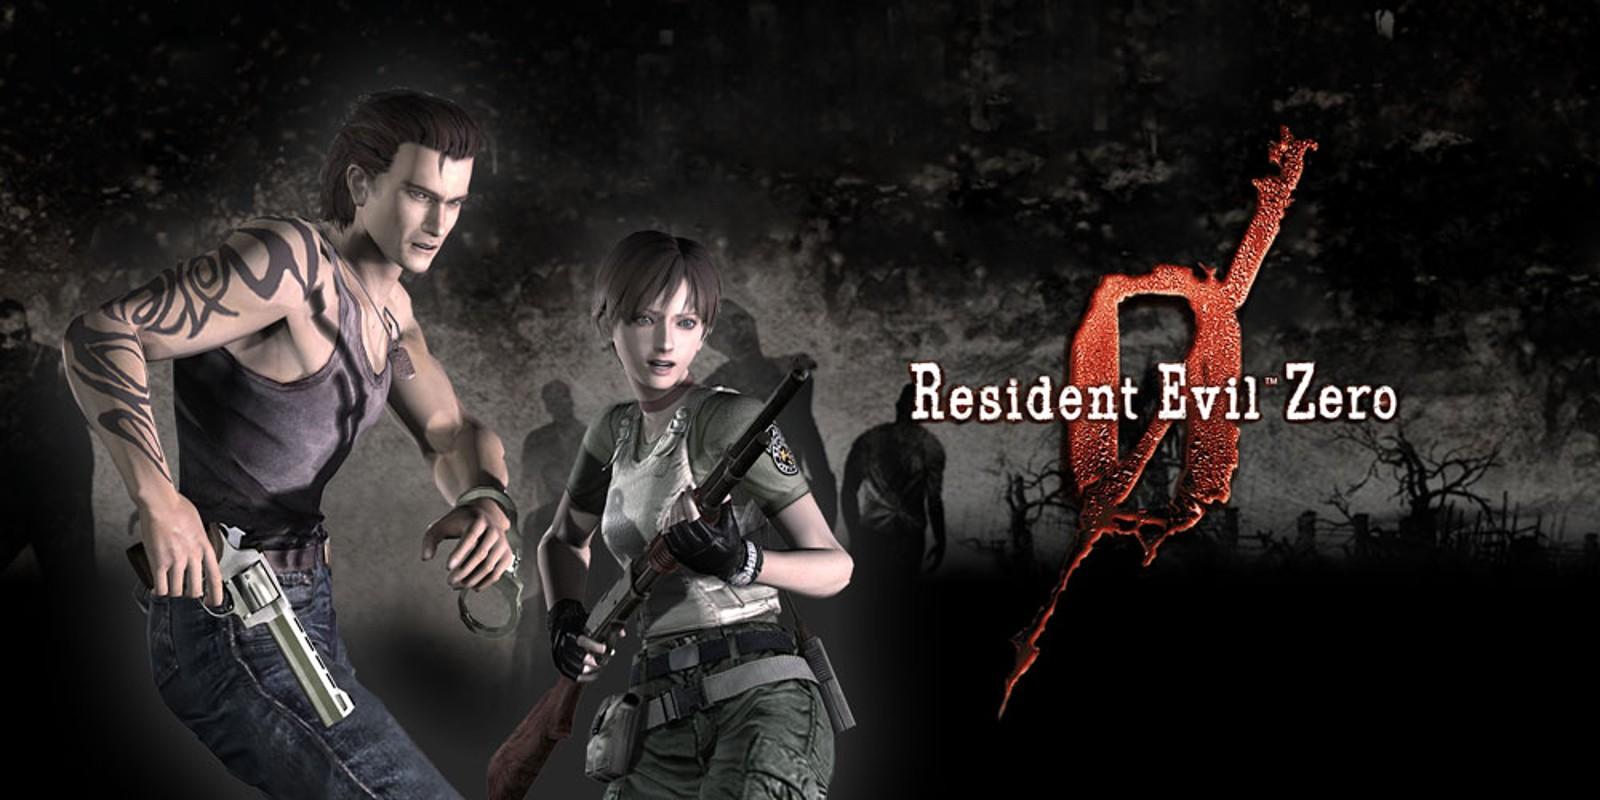 Resident Evil Zero HD Remaster اهریمن ساکن صفر نسخه اچ دی دوبله فارسی